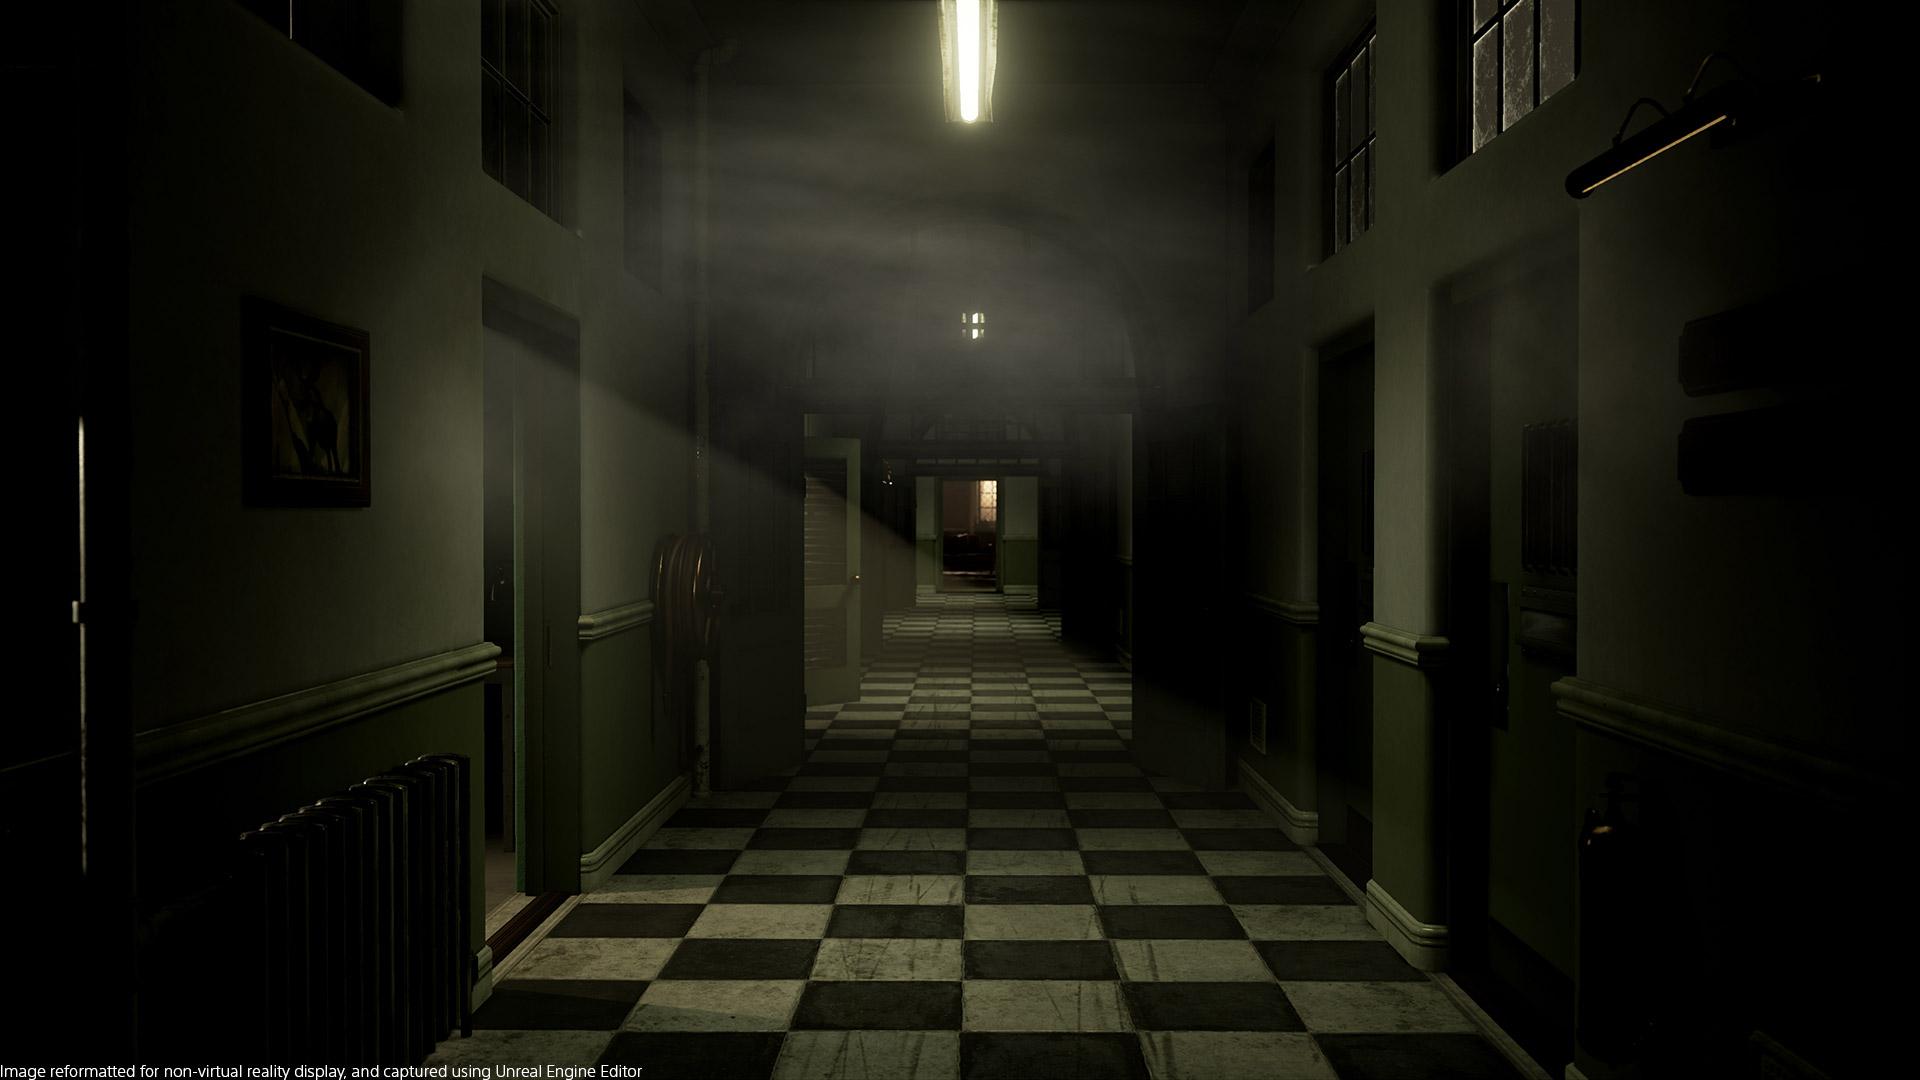 The Inpatient hallway